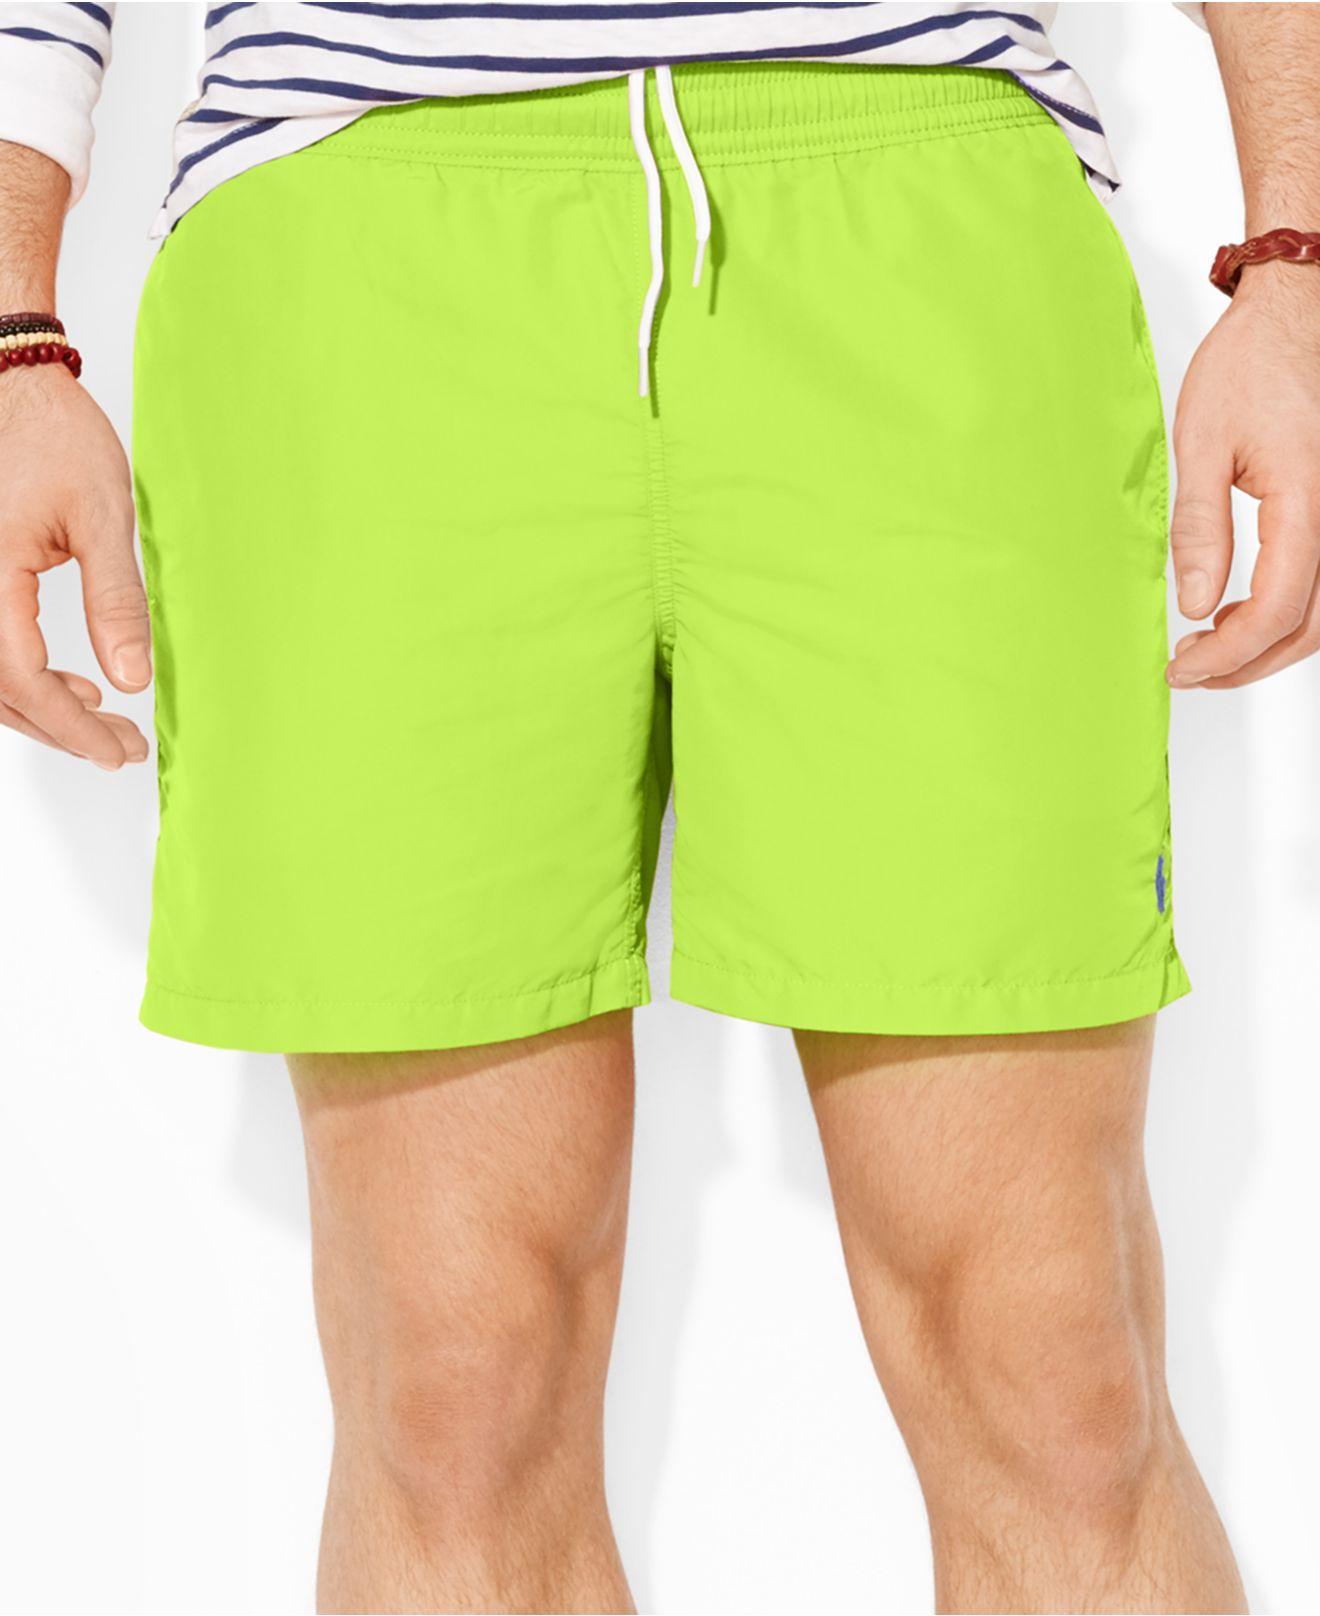 fe99f53930 Lyst - Polo Ralph Lauren Big And Tall Hawaiian Swim Shorts in Green ...